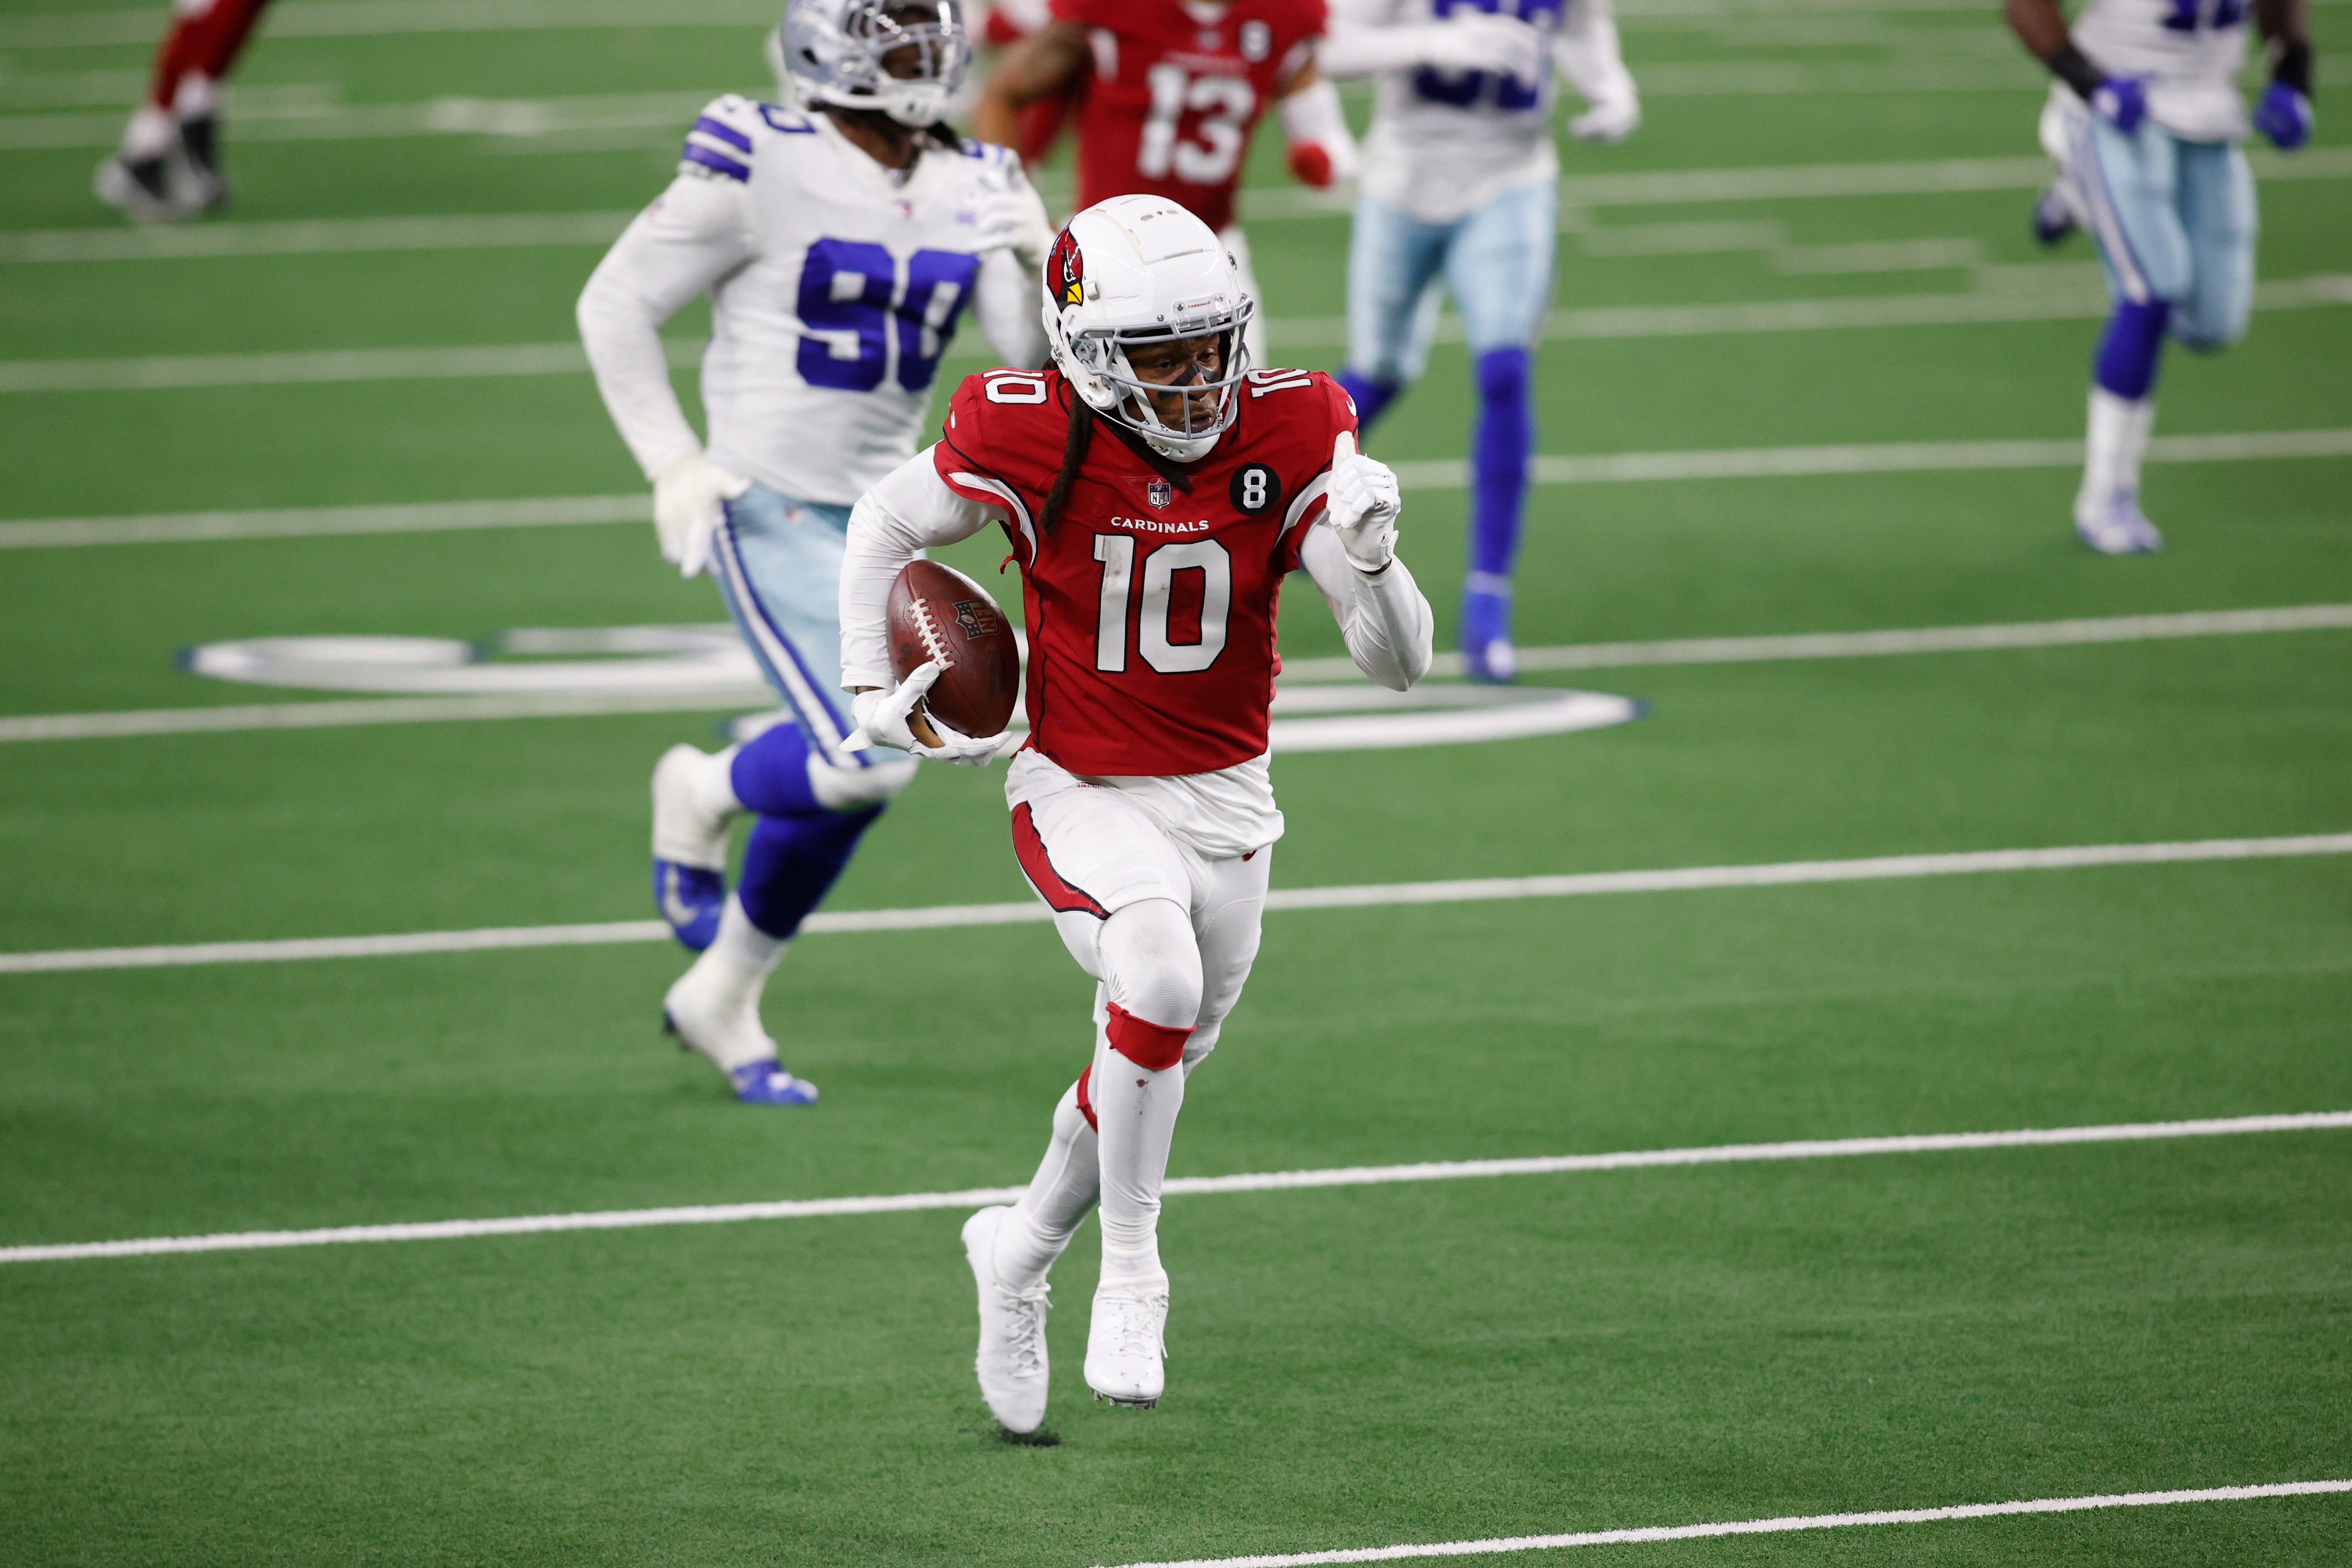 Fantasy football rankings for Week 7: Cardinals look to exploit Seahawks secondary